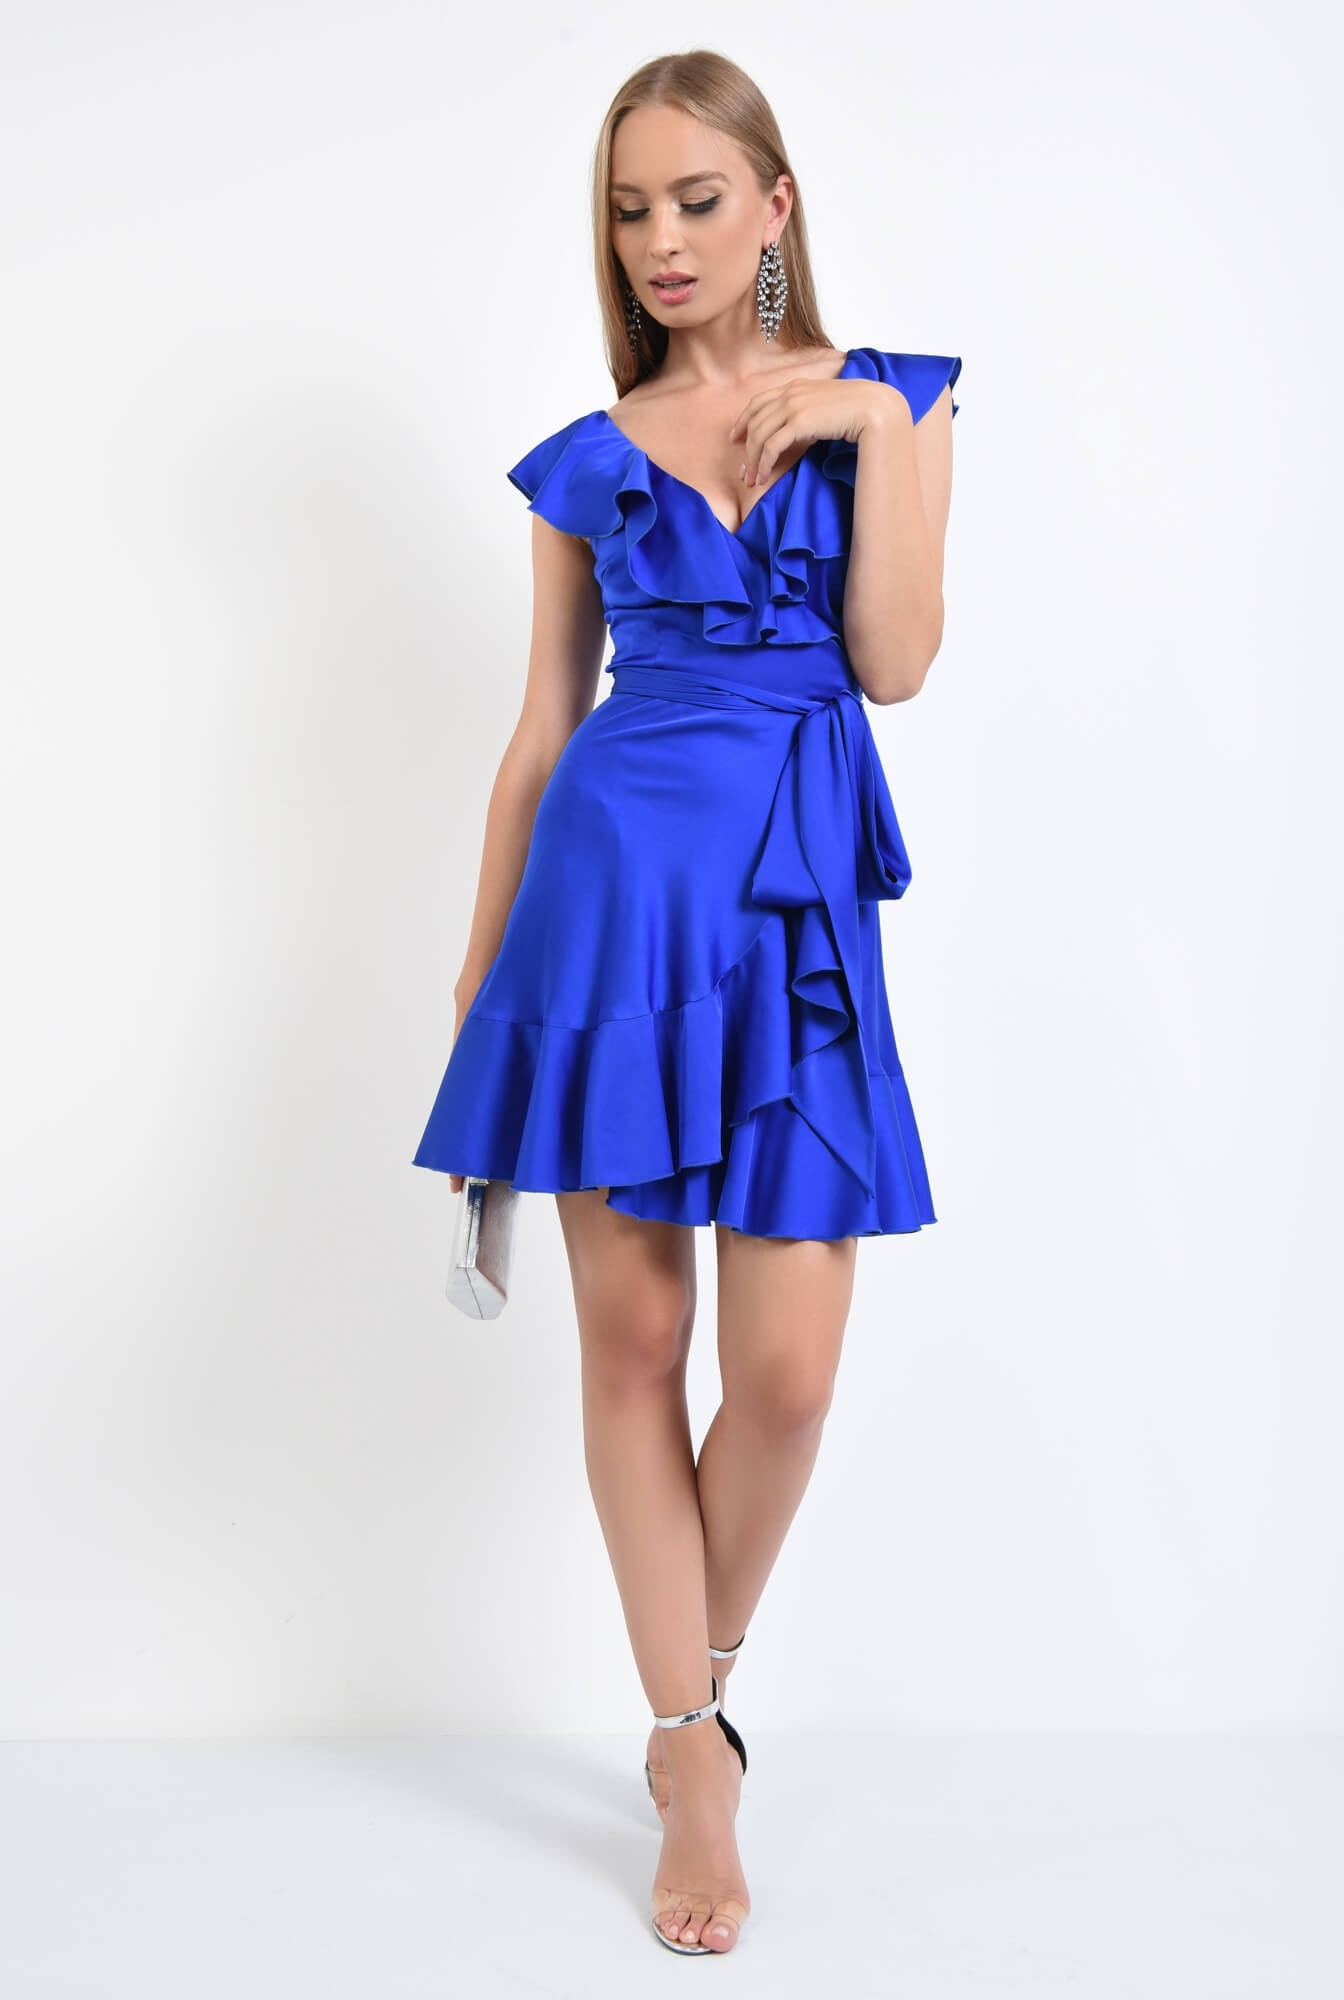 3 - rochie de seara, scurta, albastru, electric, volane, cordon